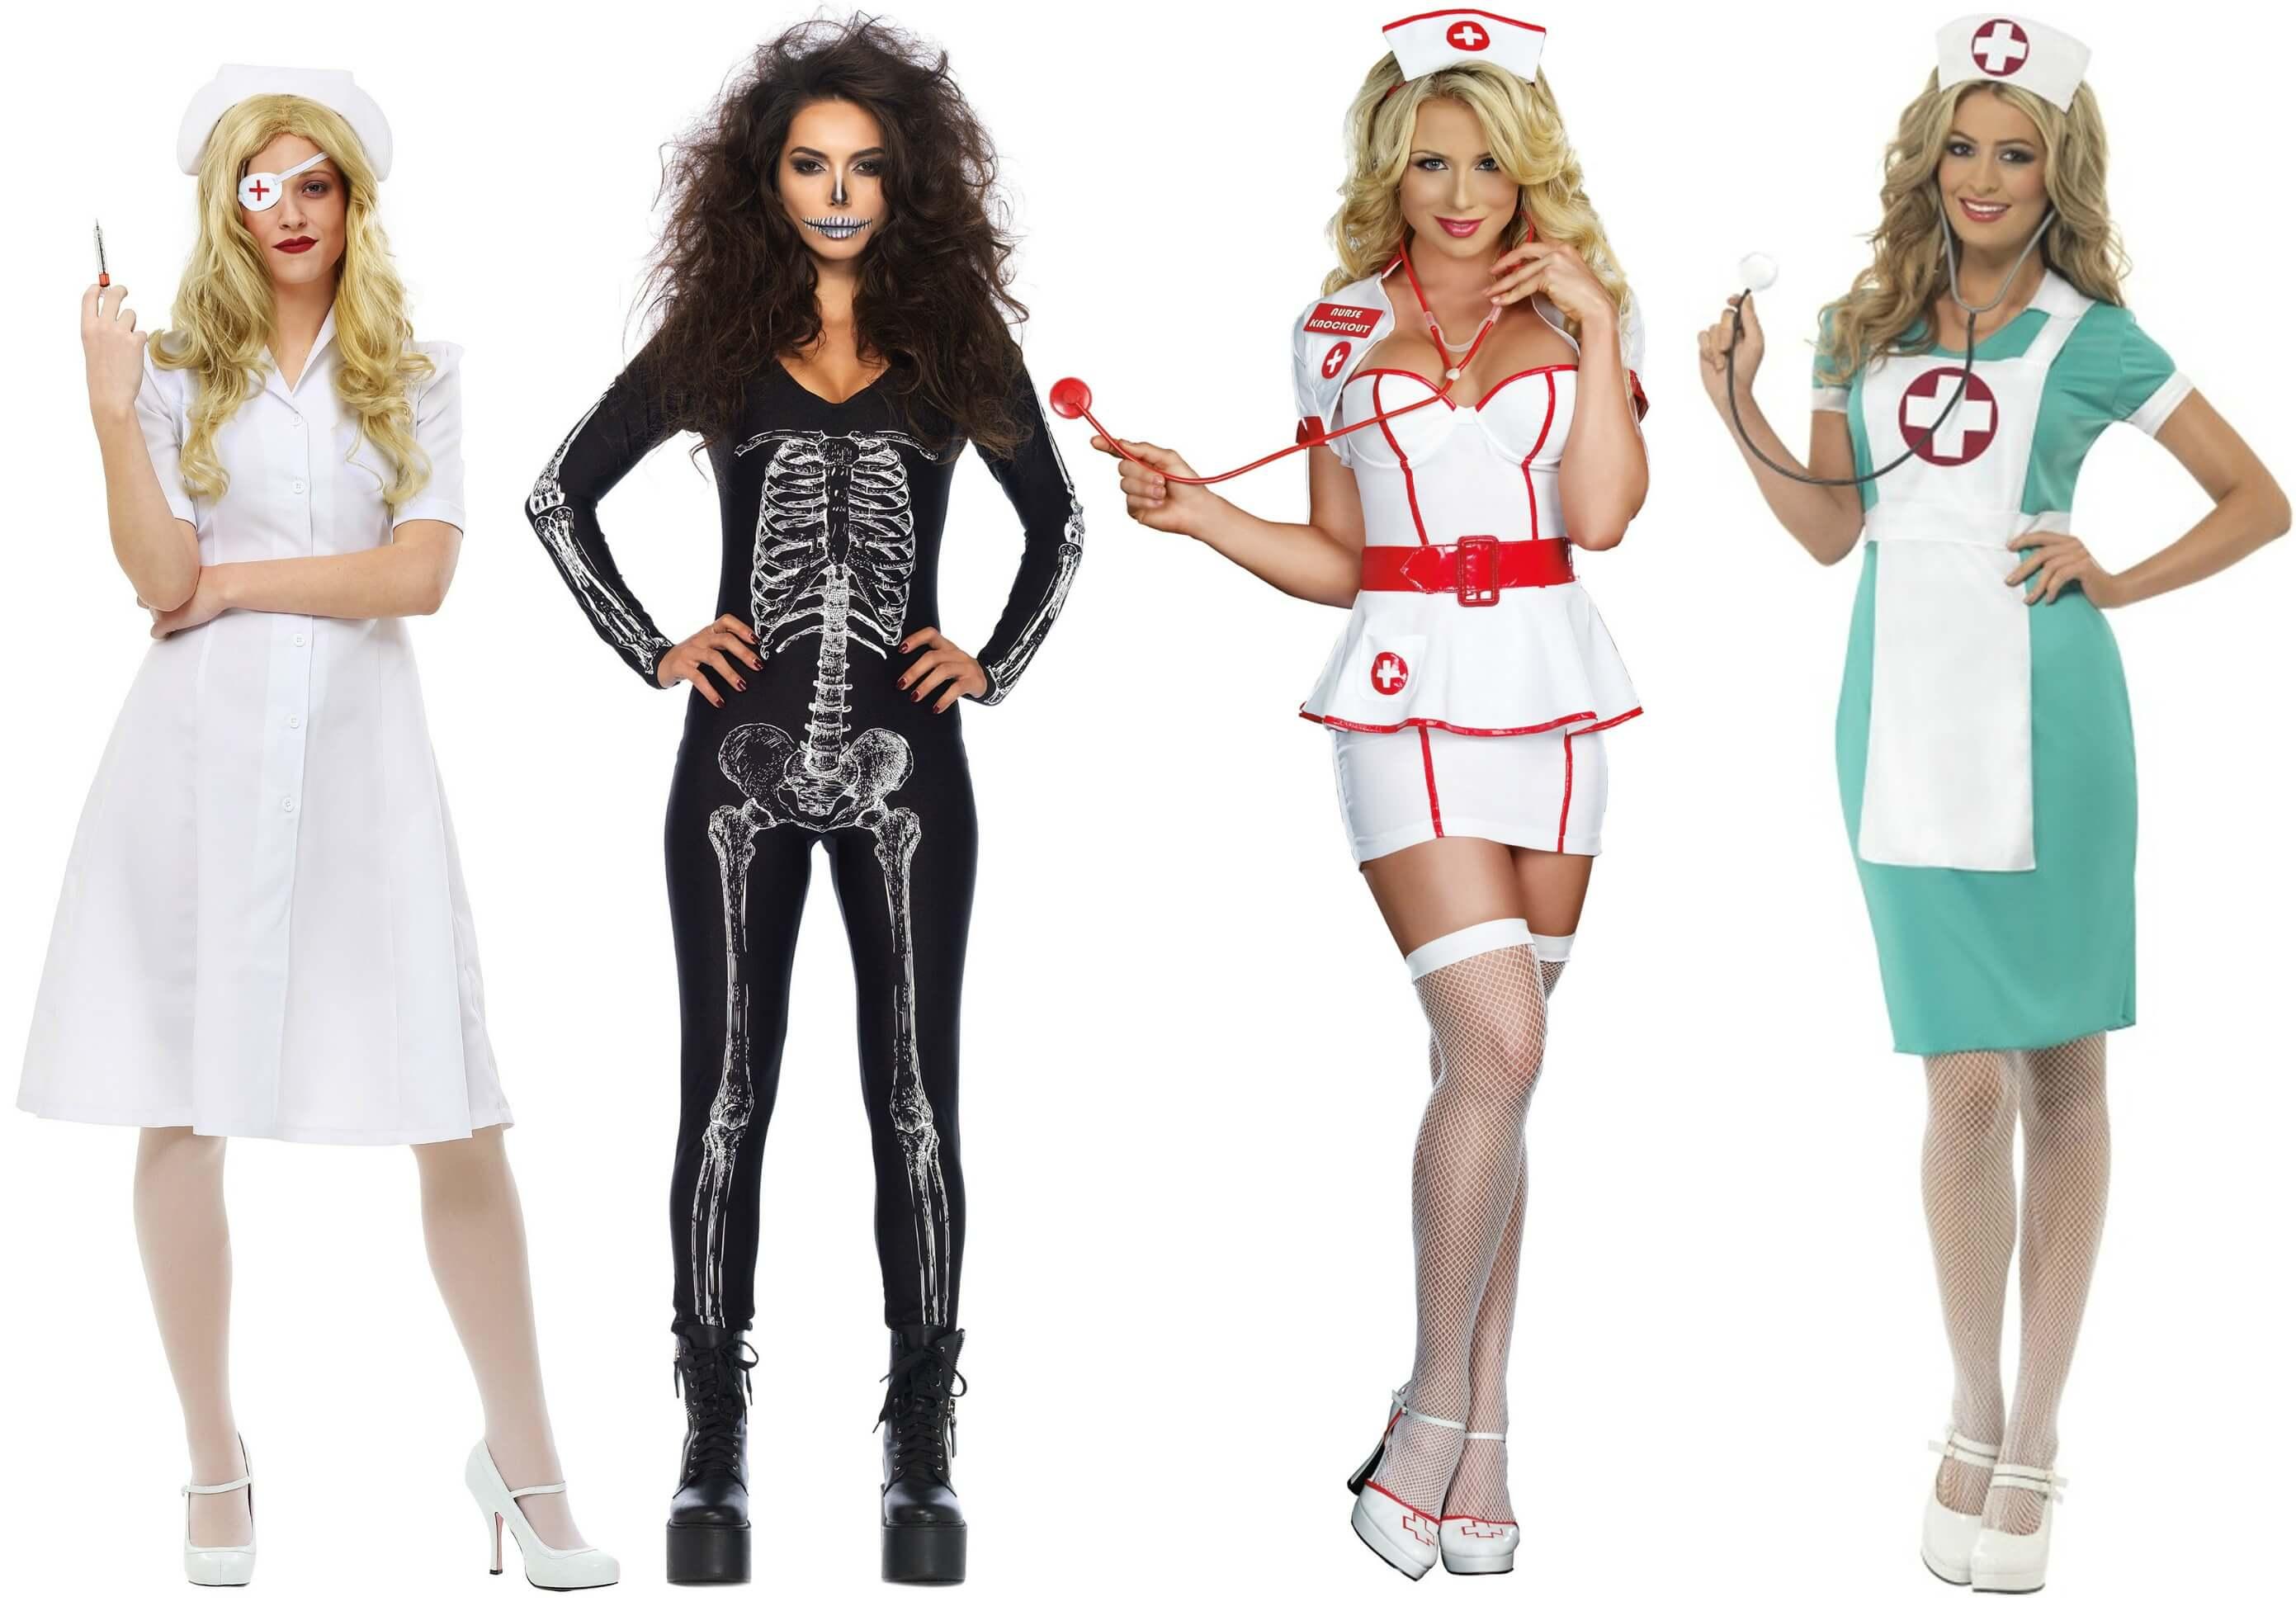 Halloween Costumes For College Girls Halloween Costumes Blog. SaveEnlarge  sc 1 st  Meningrey & Halloween Costumes College Girl - Meningrey